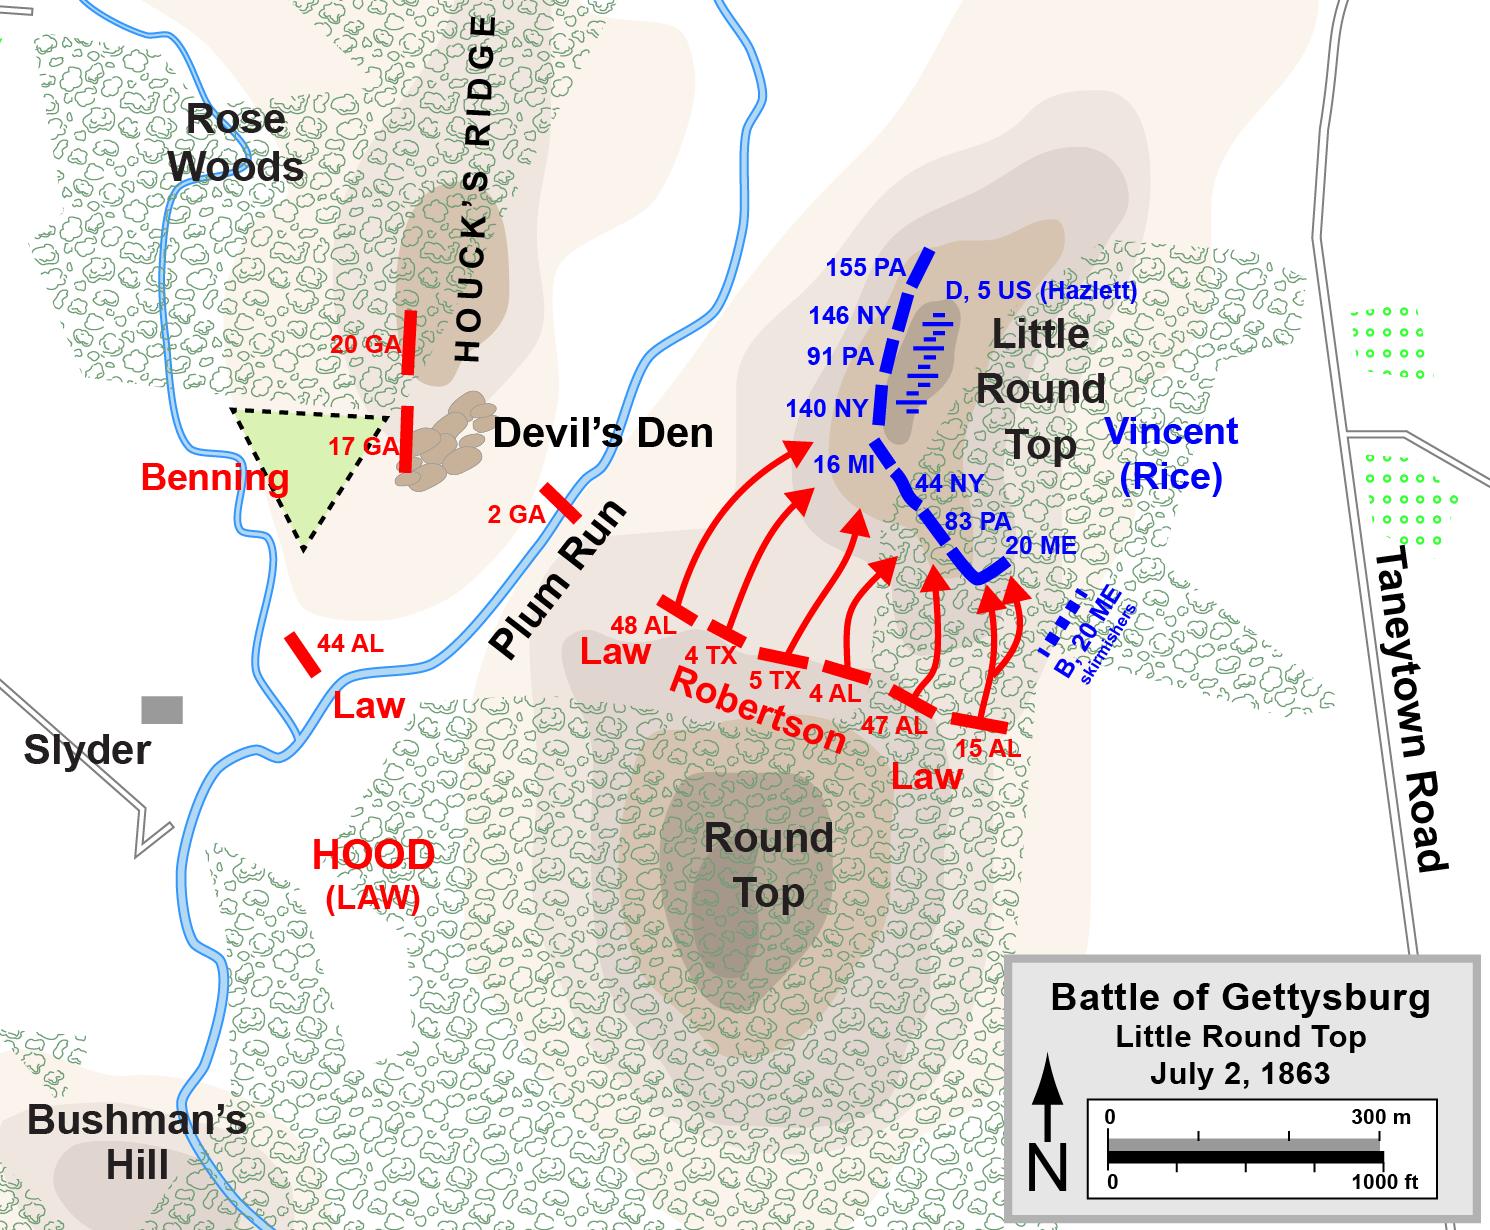 Map Of Little Round Top Battle Of Gettysburg Of The American - Battle of gettysburg map us